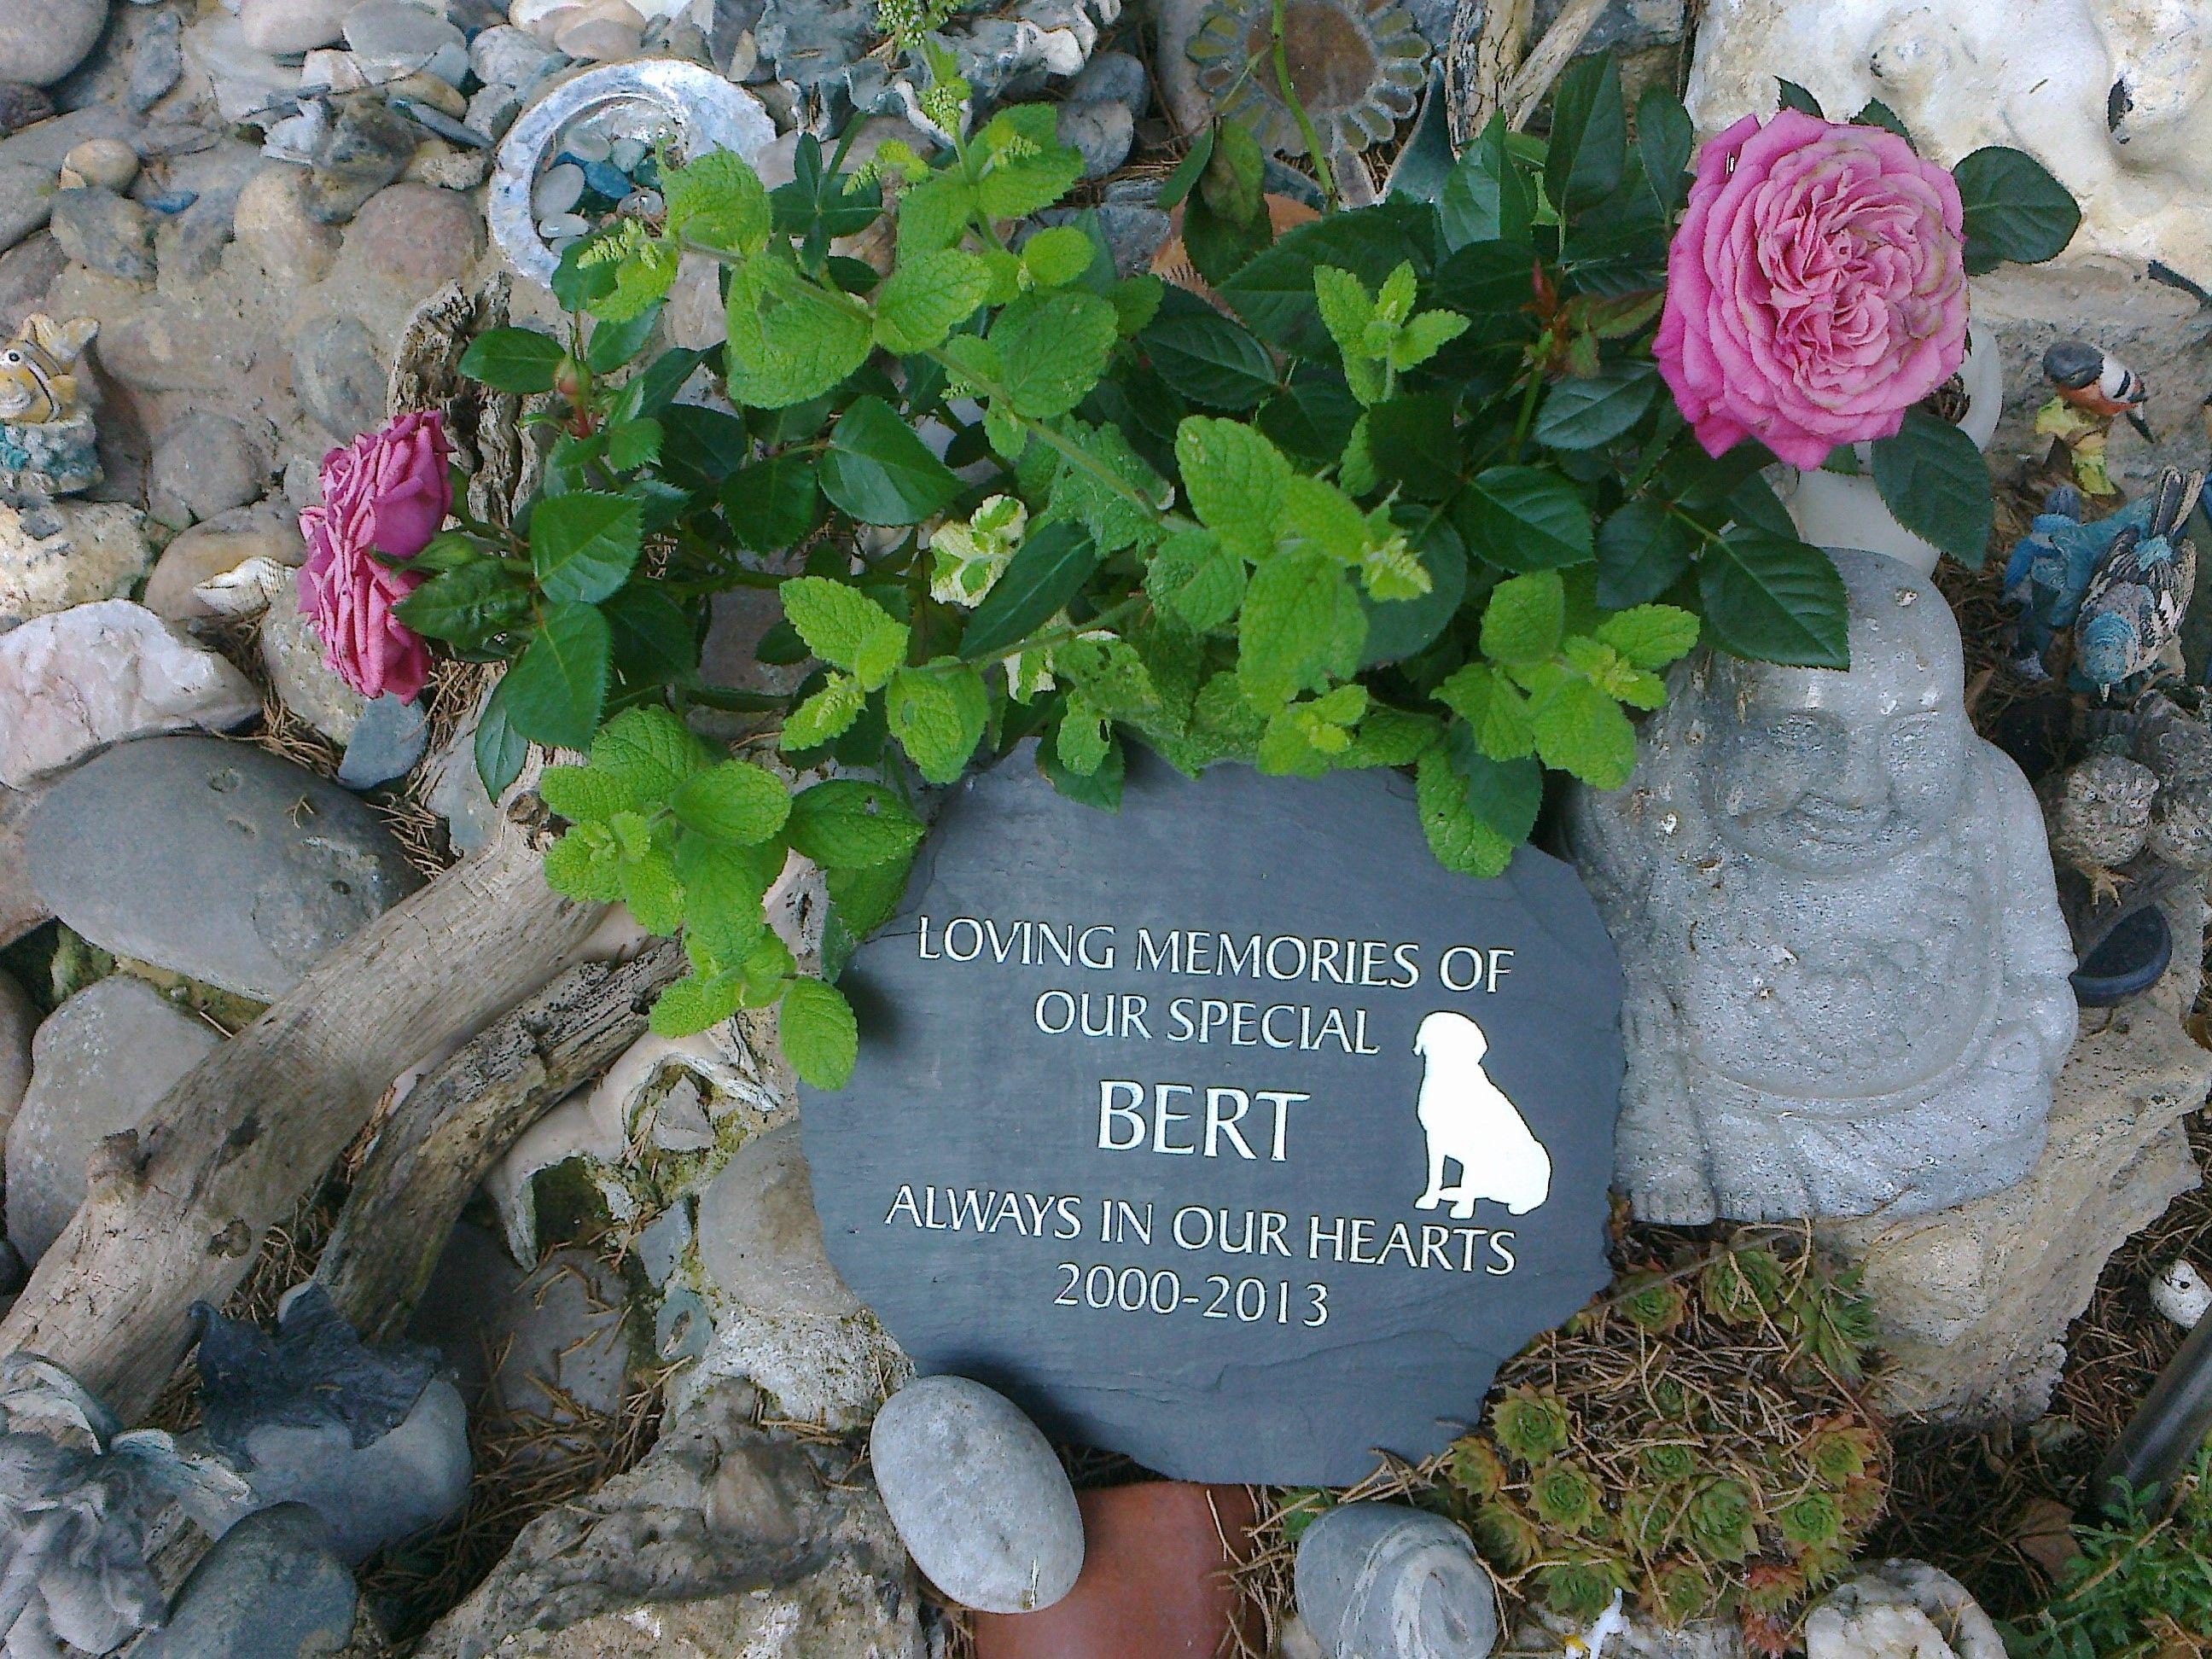 Pet Memorials | Pinterest | Pet memorials and Gardens